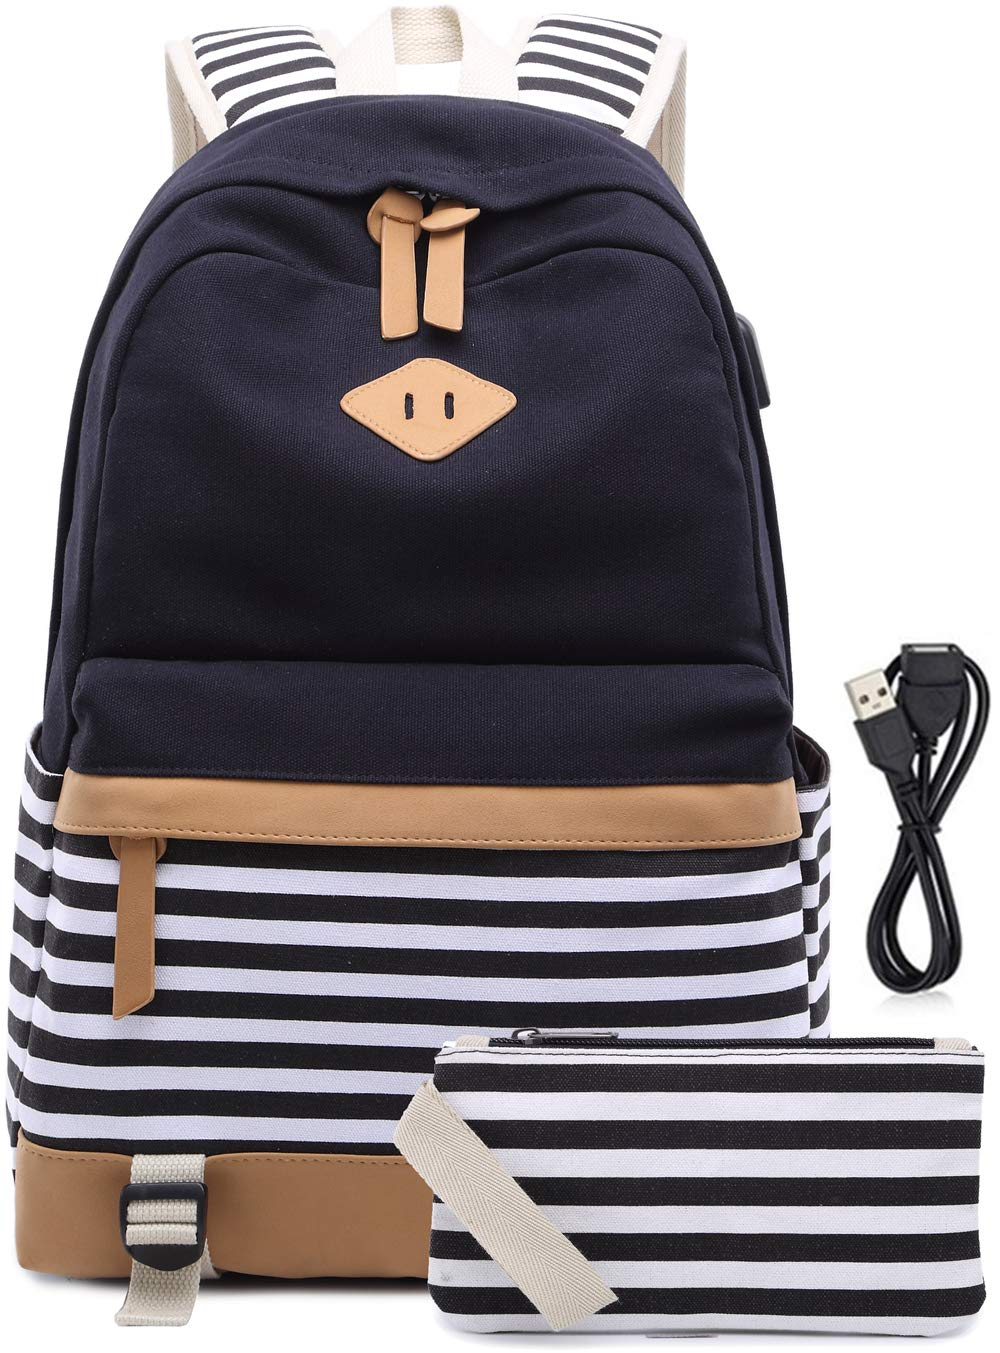 6a8f96bb5f9 Canvas Backpack Girls Stripe School Bookbag Women College Backpack With USB  Port Black